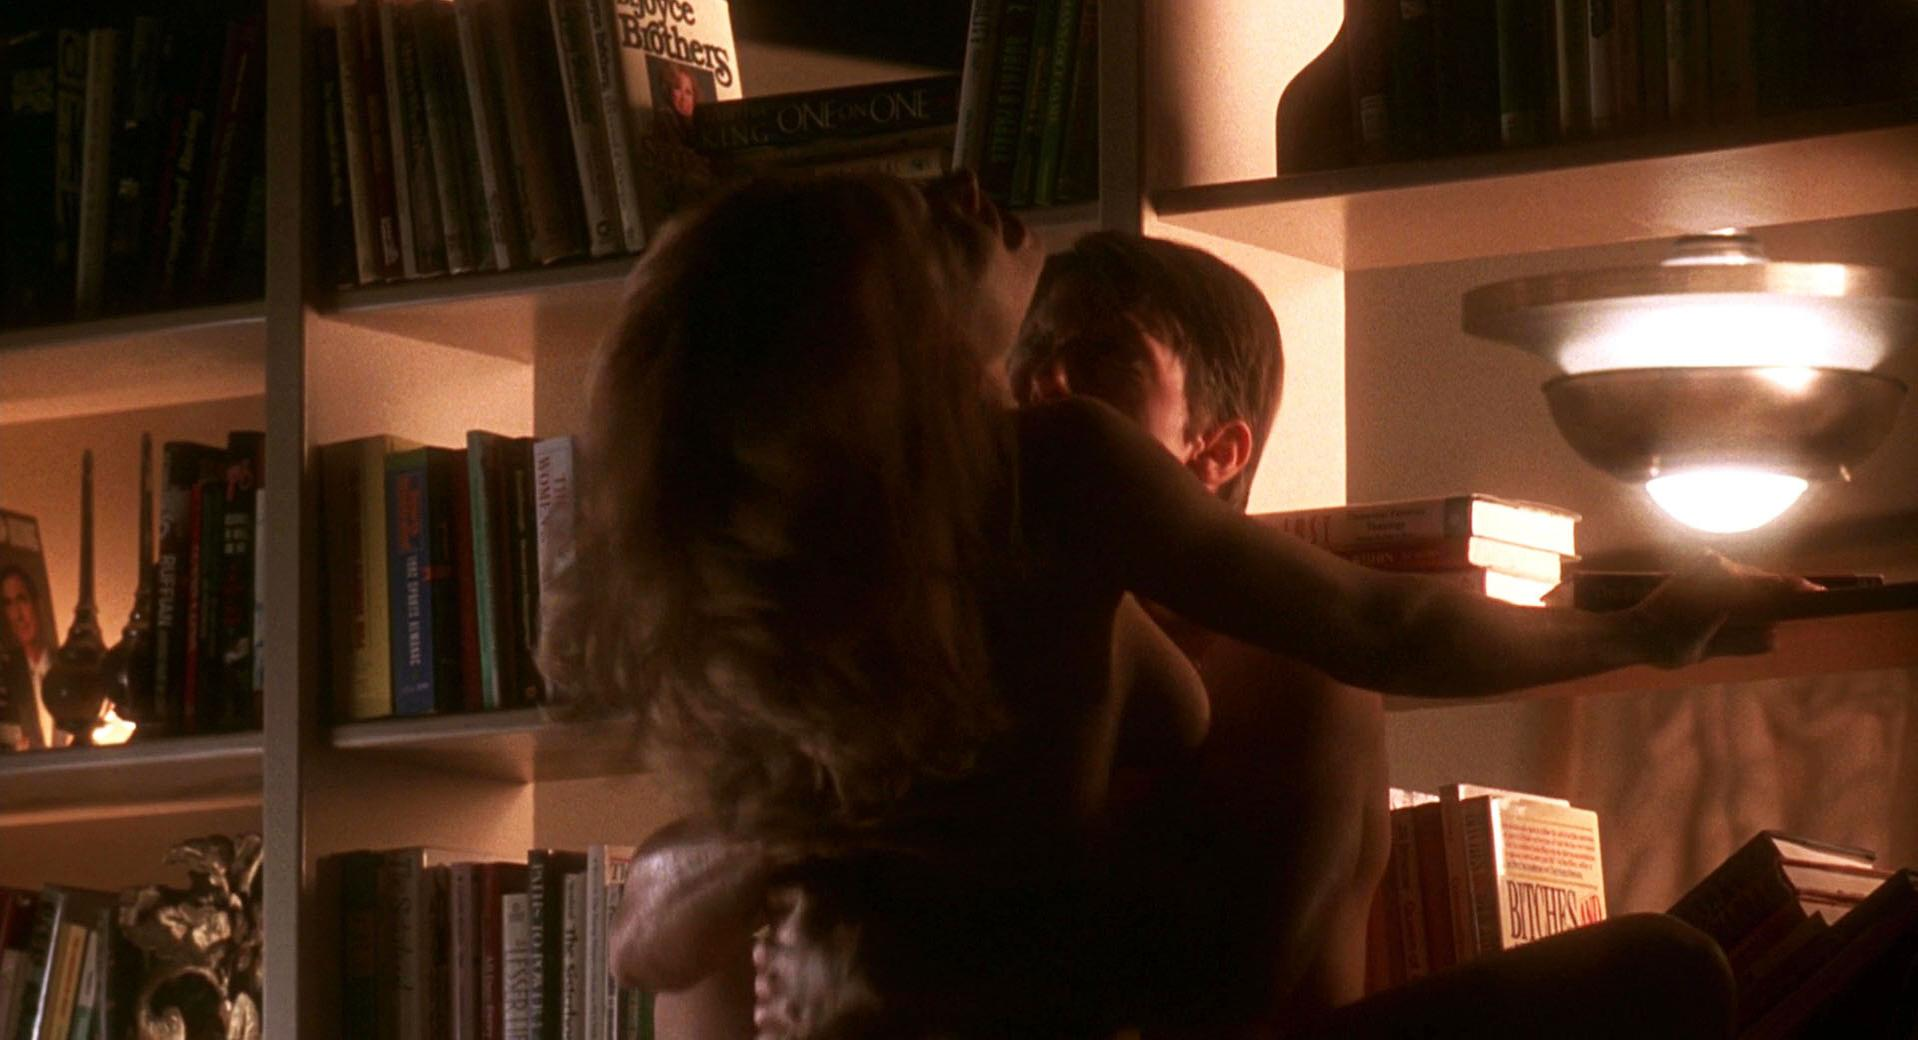 Jerry maguire sex scene video